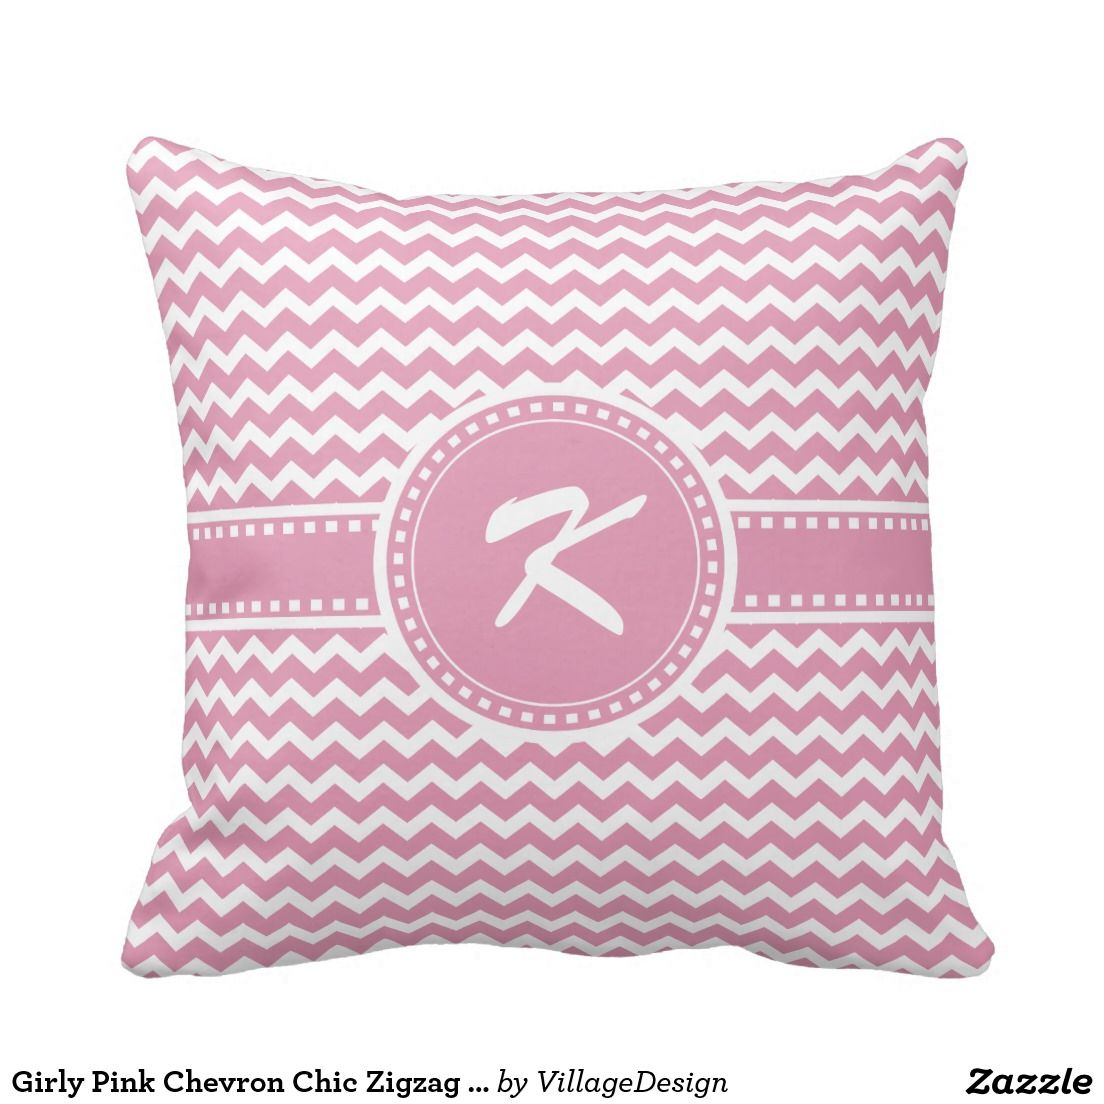 Girly Pink Chevron Chic Zigzag Stripes Pillow